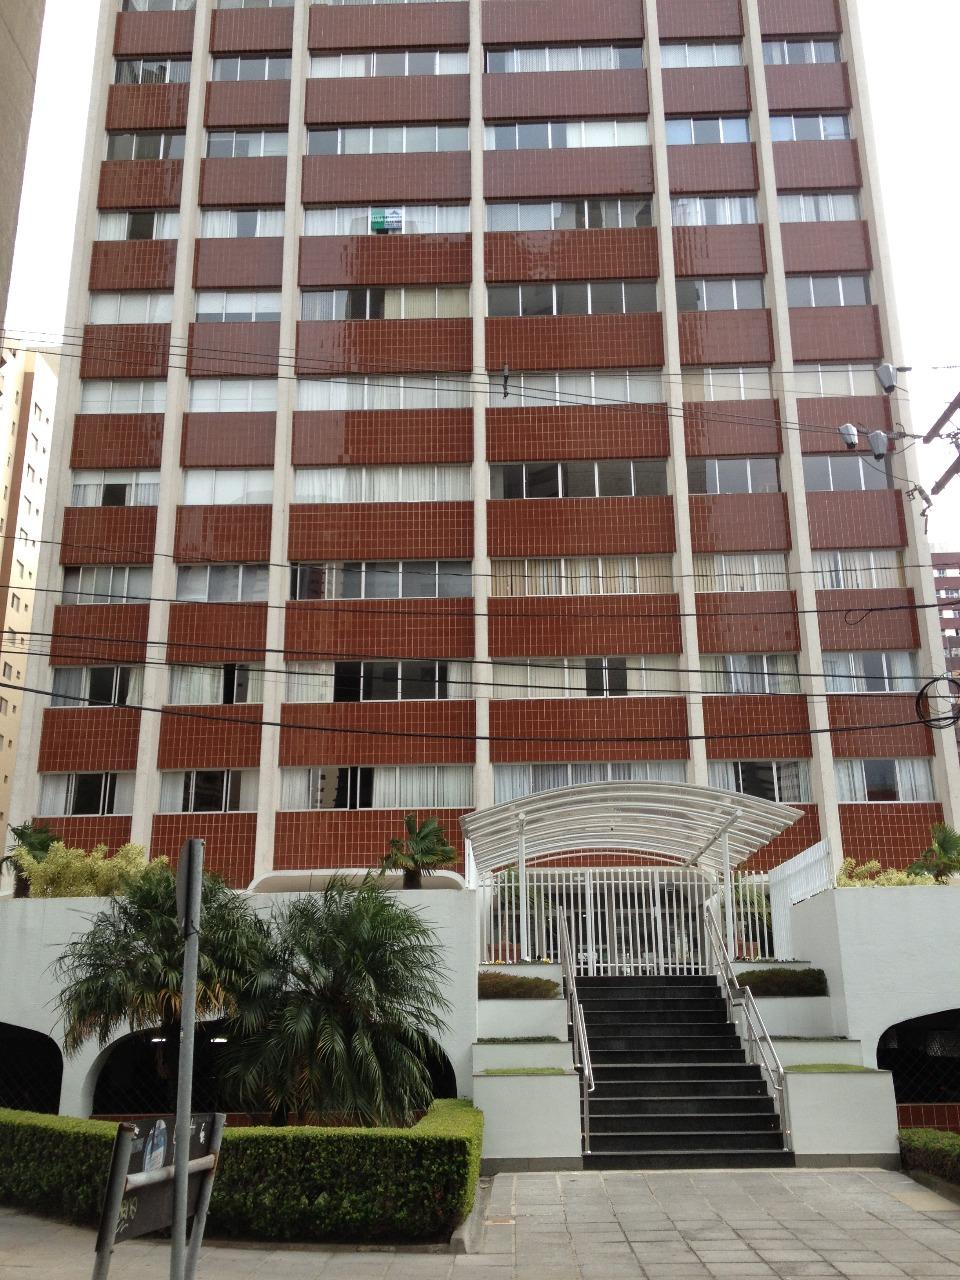 Apartamento Totalmente Reformado 3 Dorm. 1 Suíte 1 Vaga Bigorrilho/Champagnat 102m² Ref. 3515